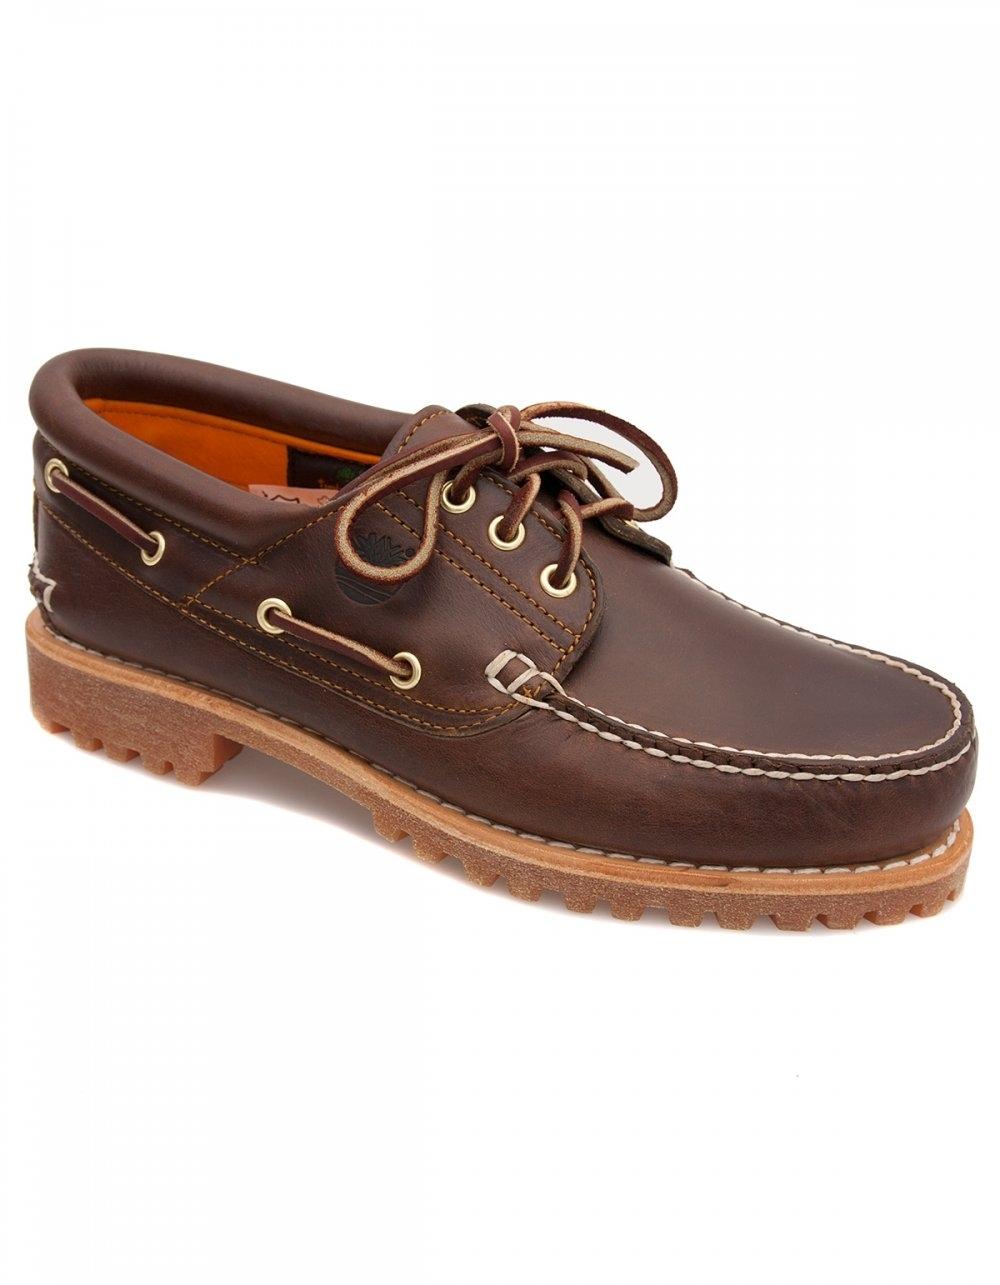 Traditional 3 Eye Lug Boat Shoe Brown